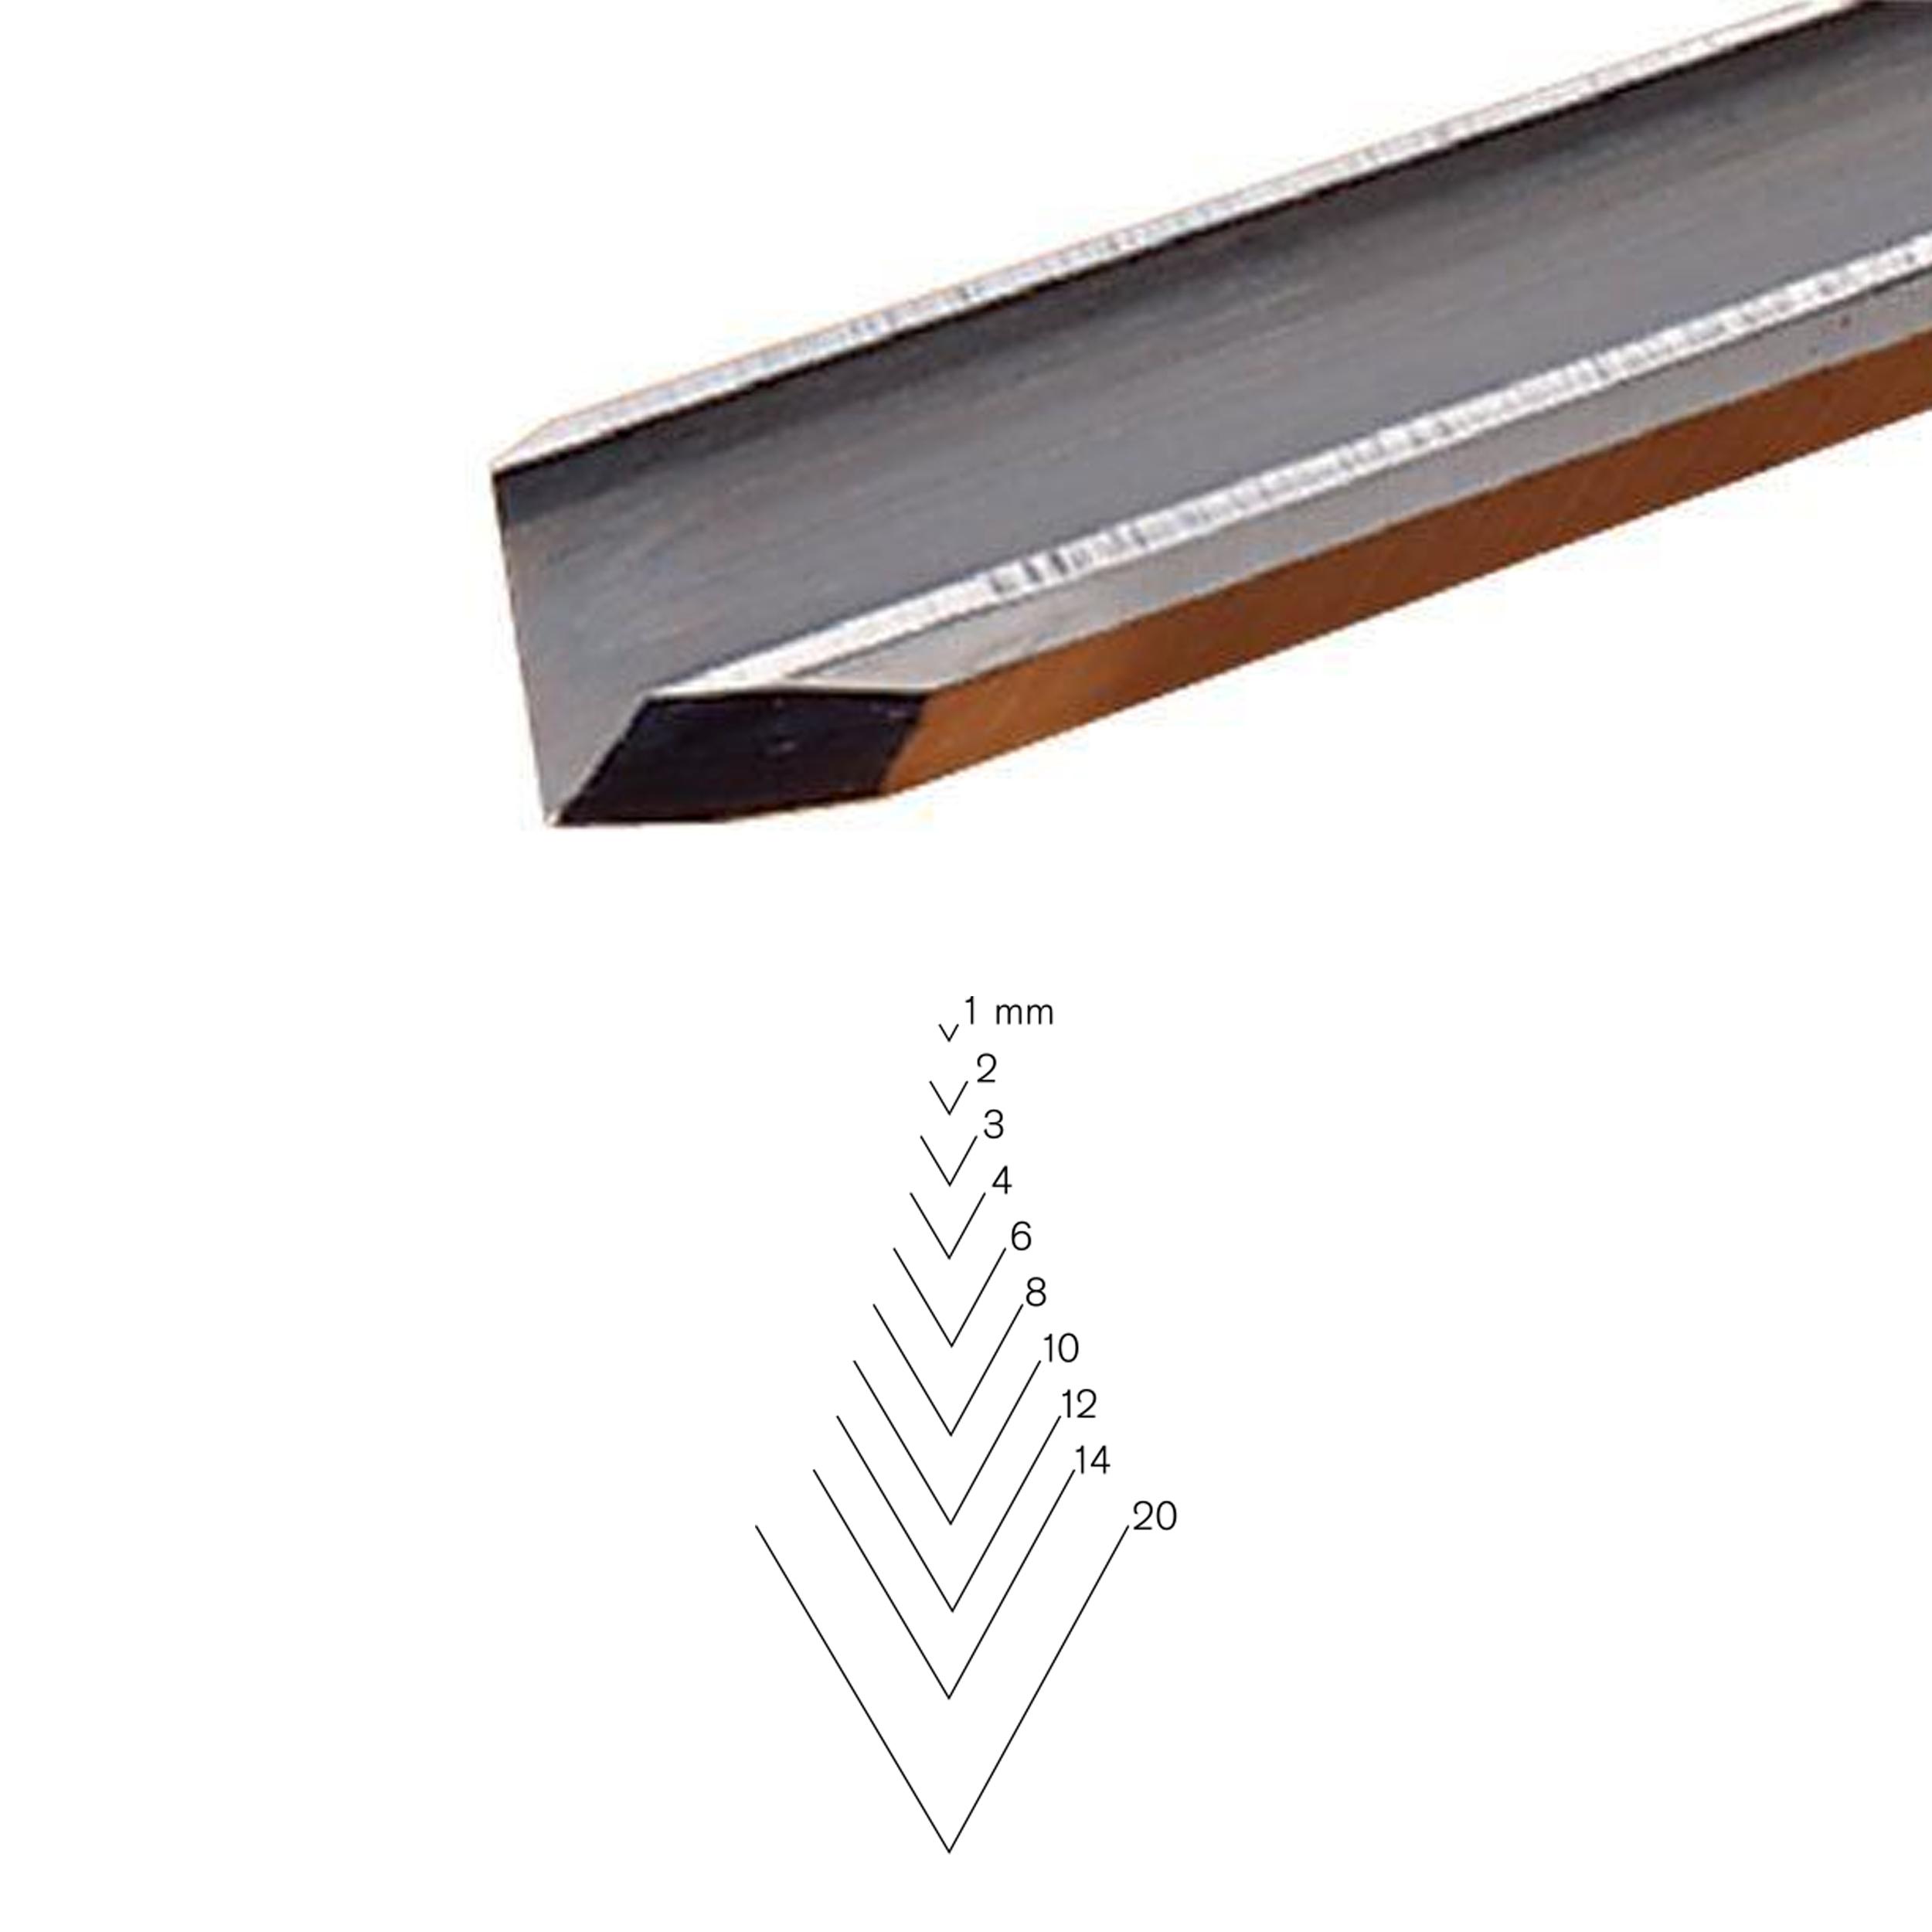 PFEILSwiss Made 4mm #8 Sweep Spoon Gouge